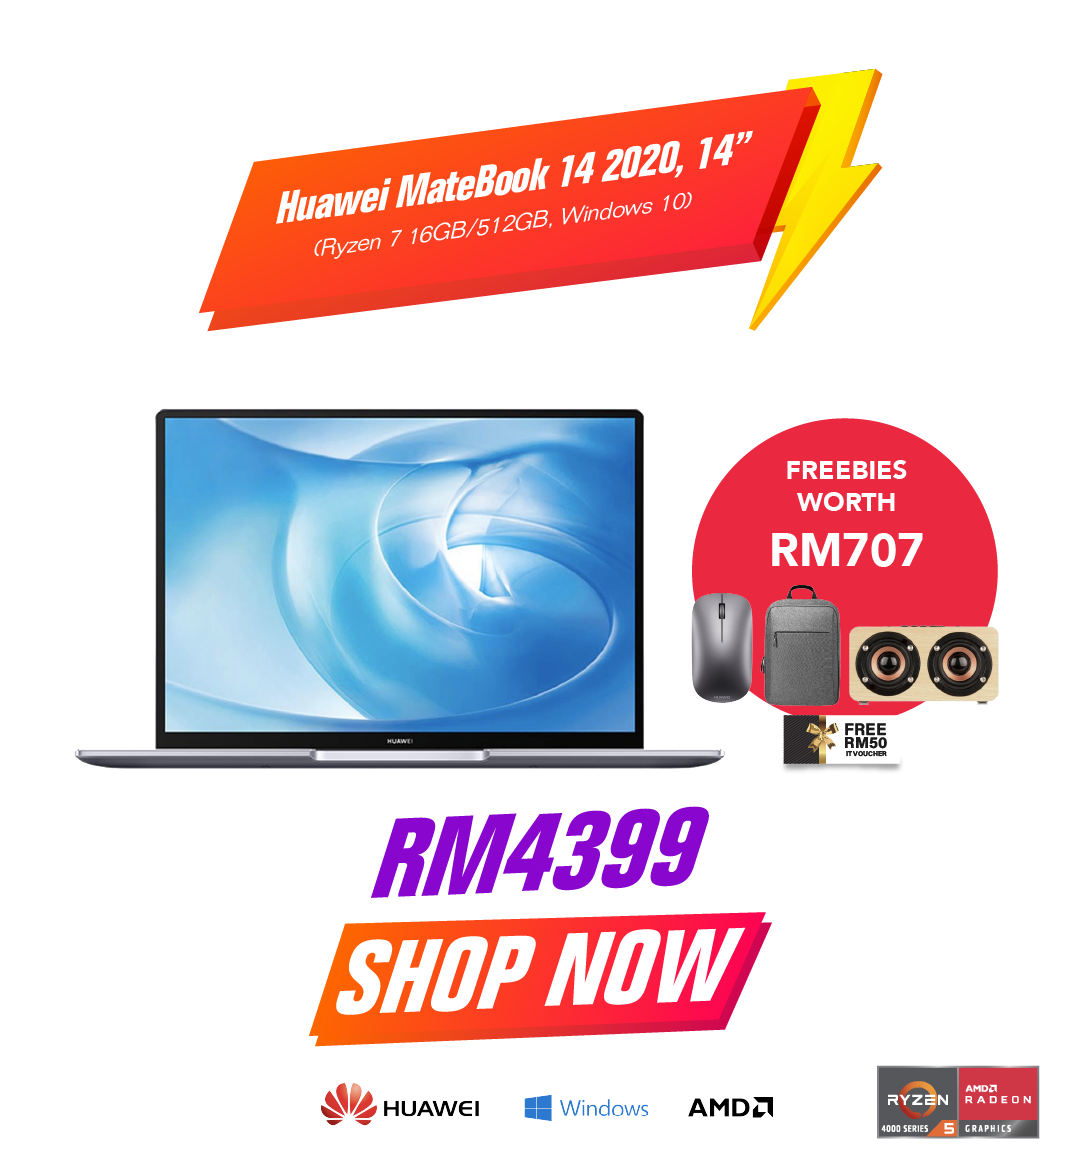 Huawei MateBook 14 2020 Ryzen 7 16GB/512GB Windows 10